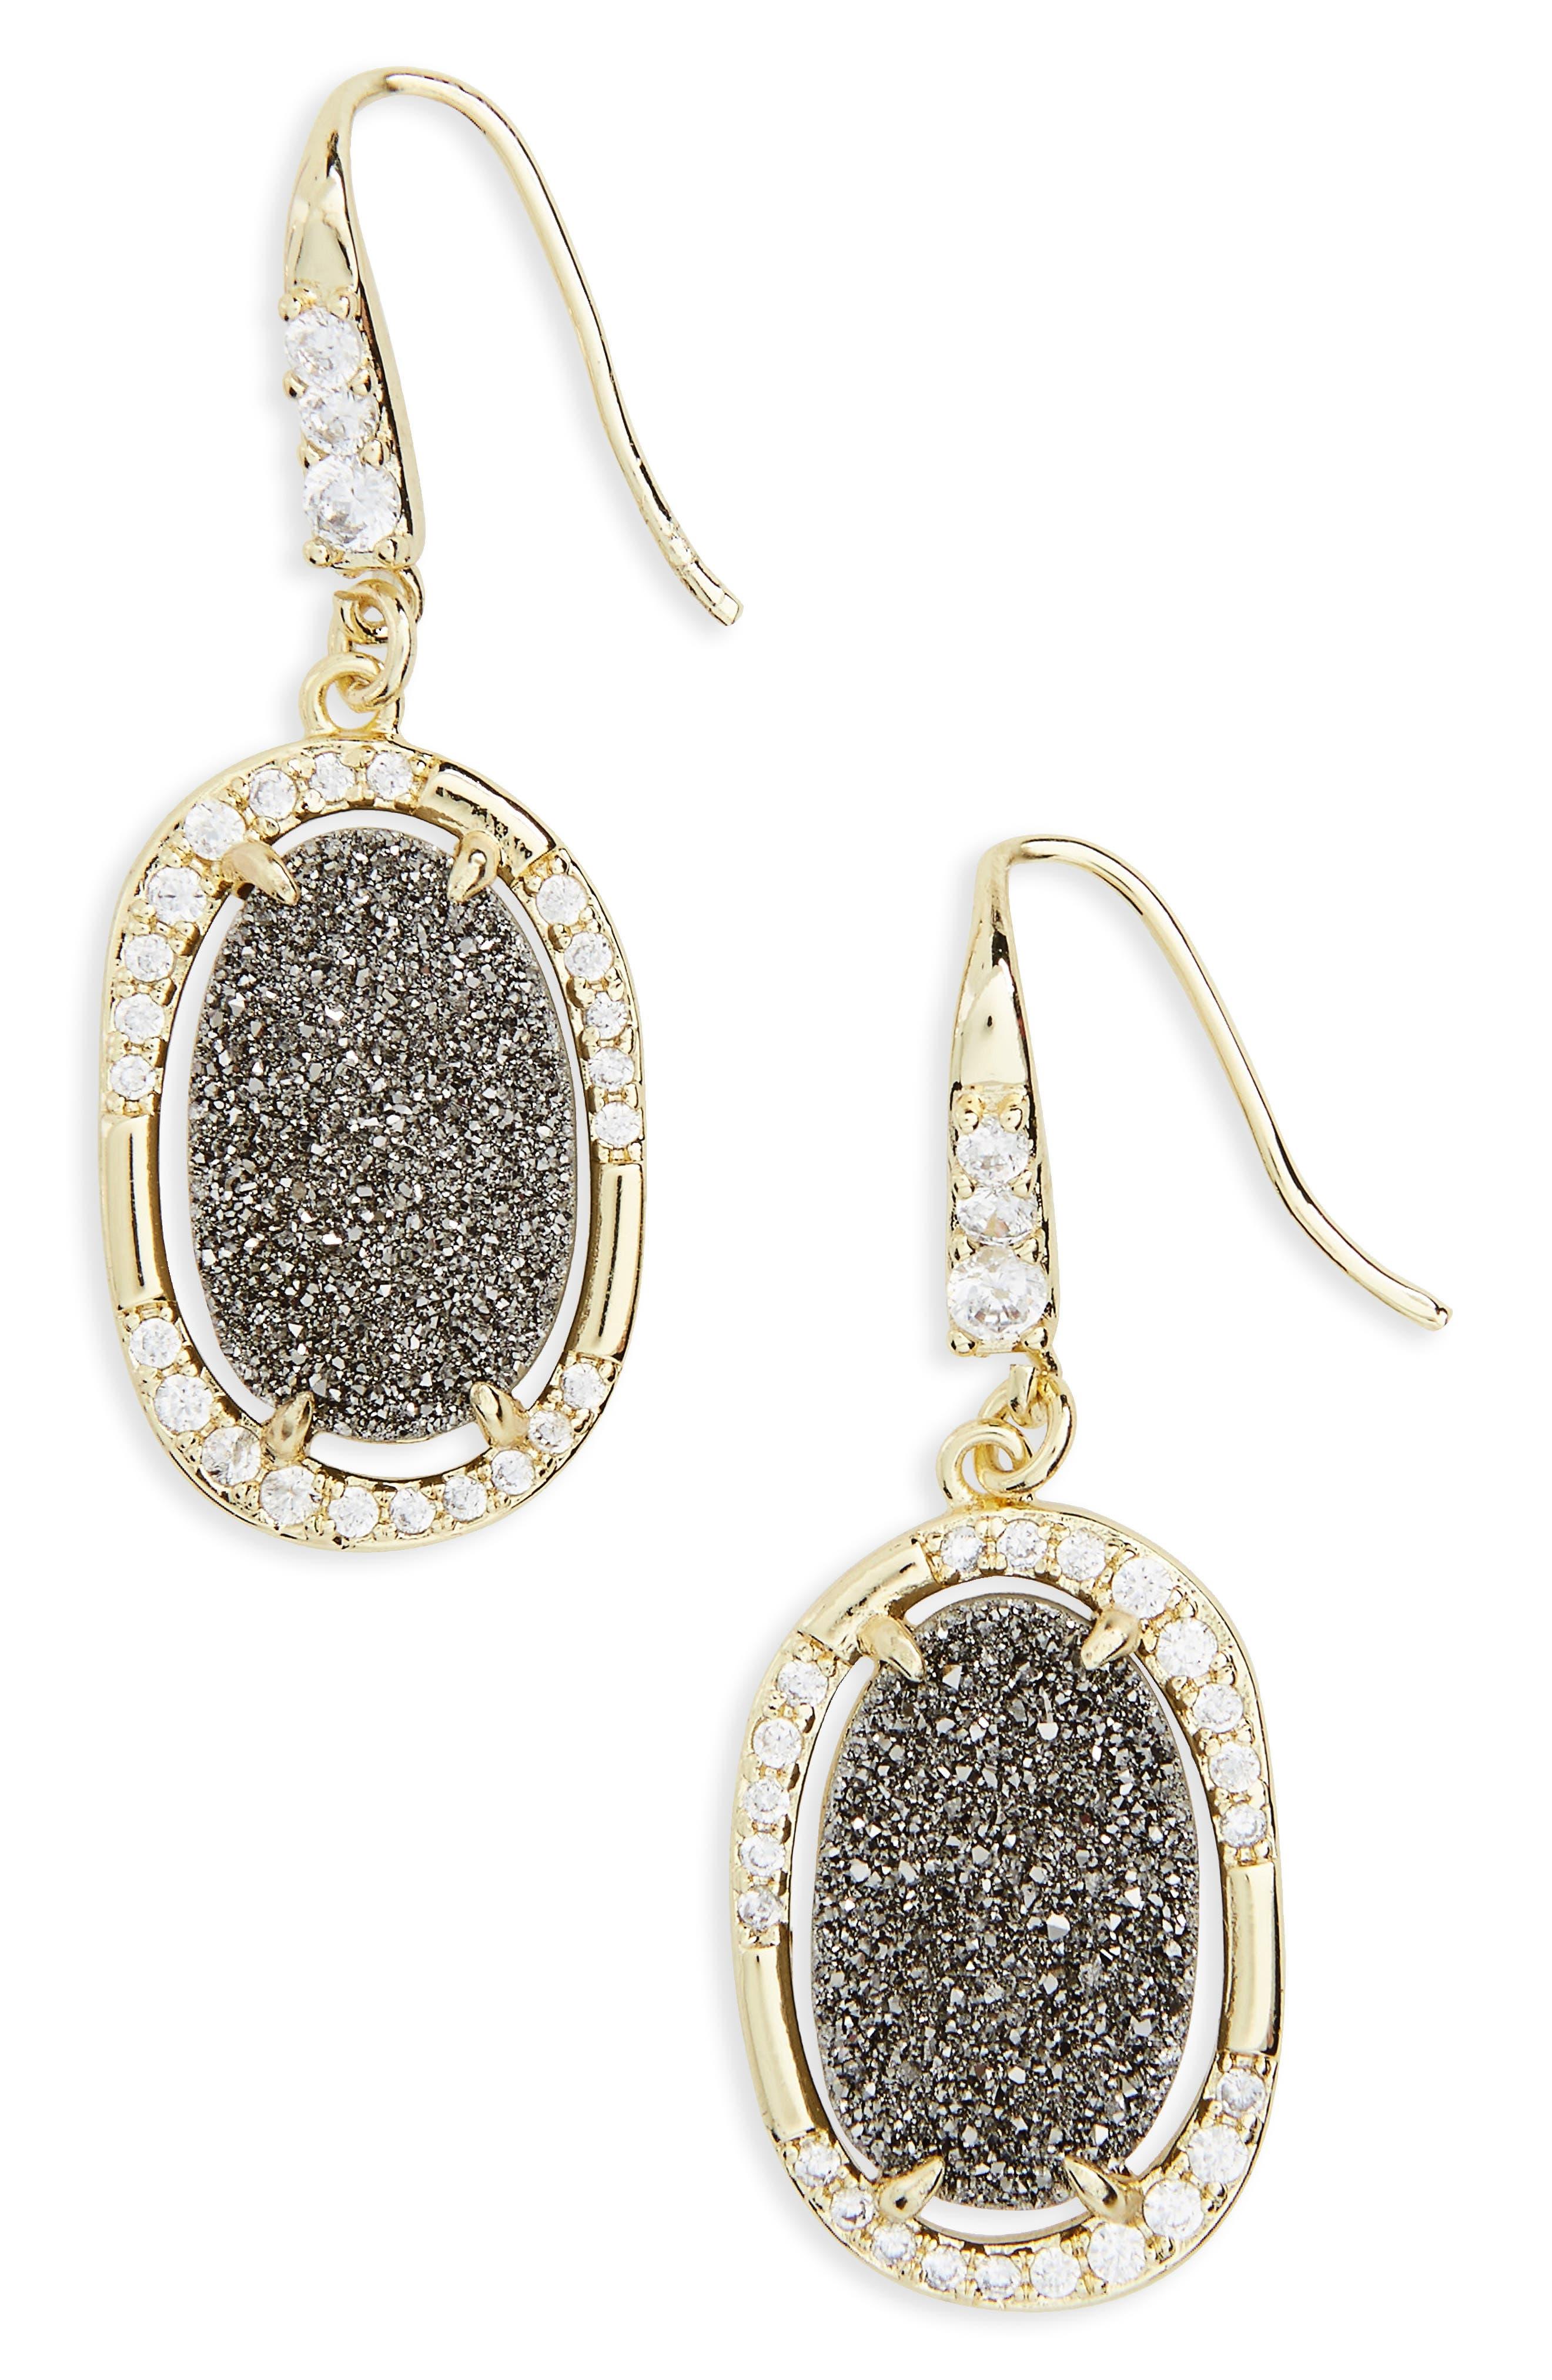 Kathy Drop Earrings,                             Main thumbnail 1, color,                             Grey Druzy/ Gold